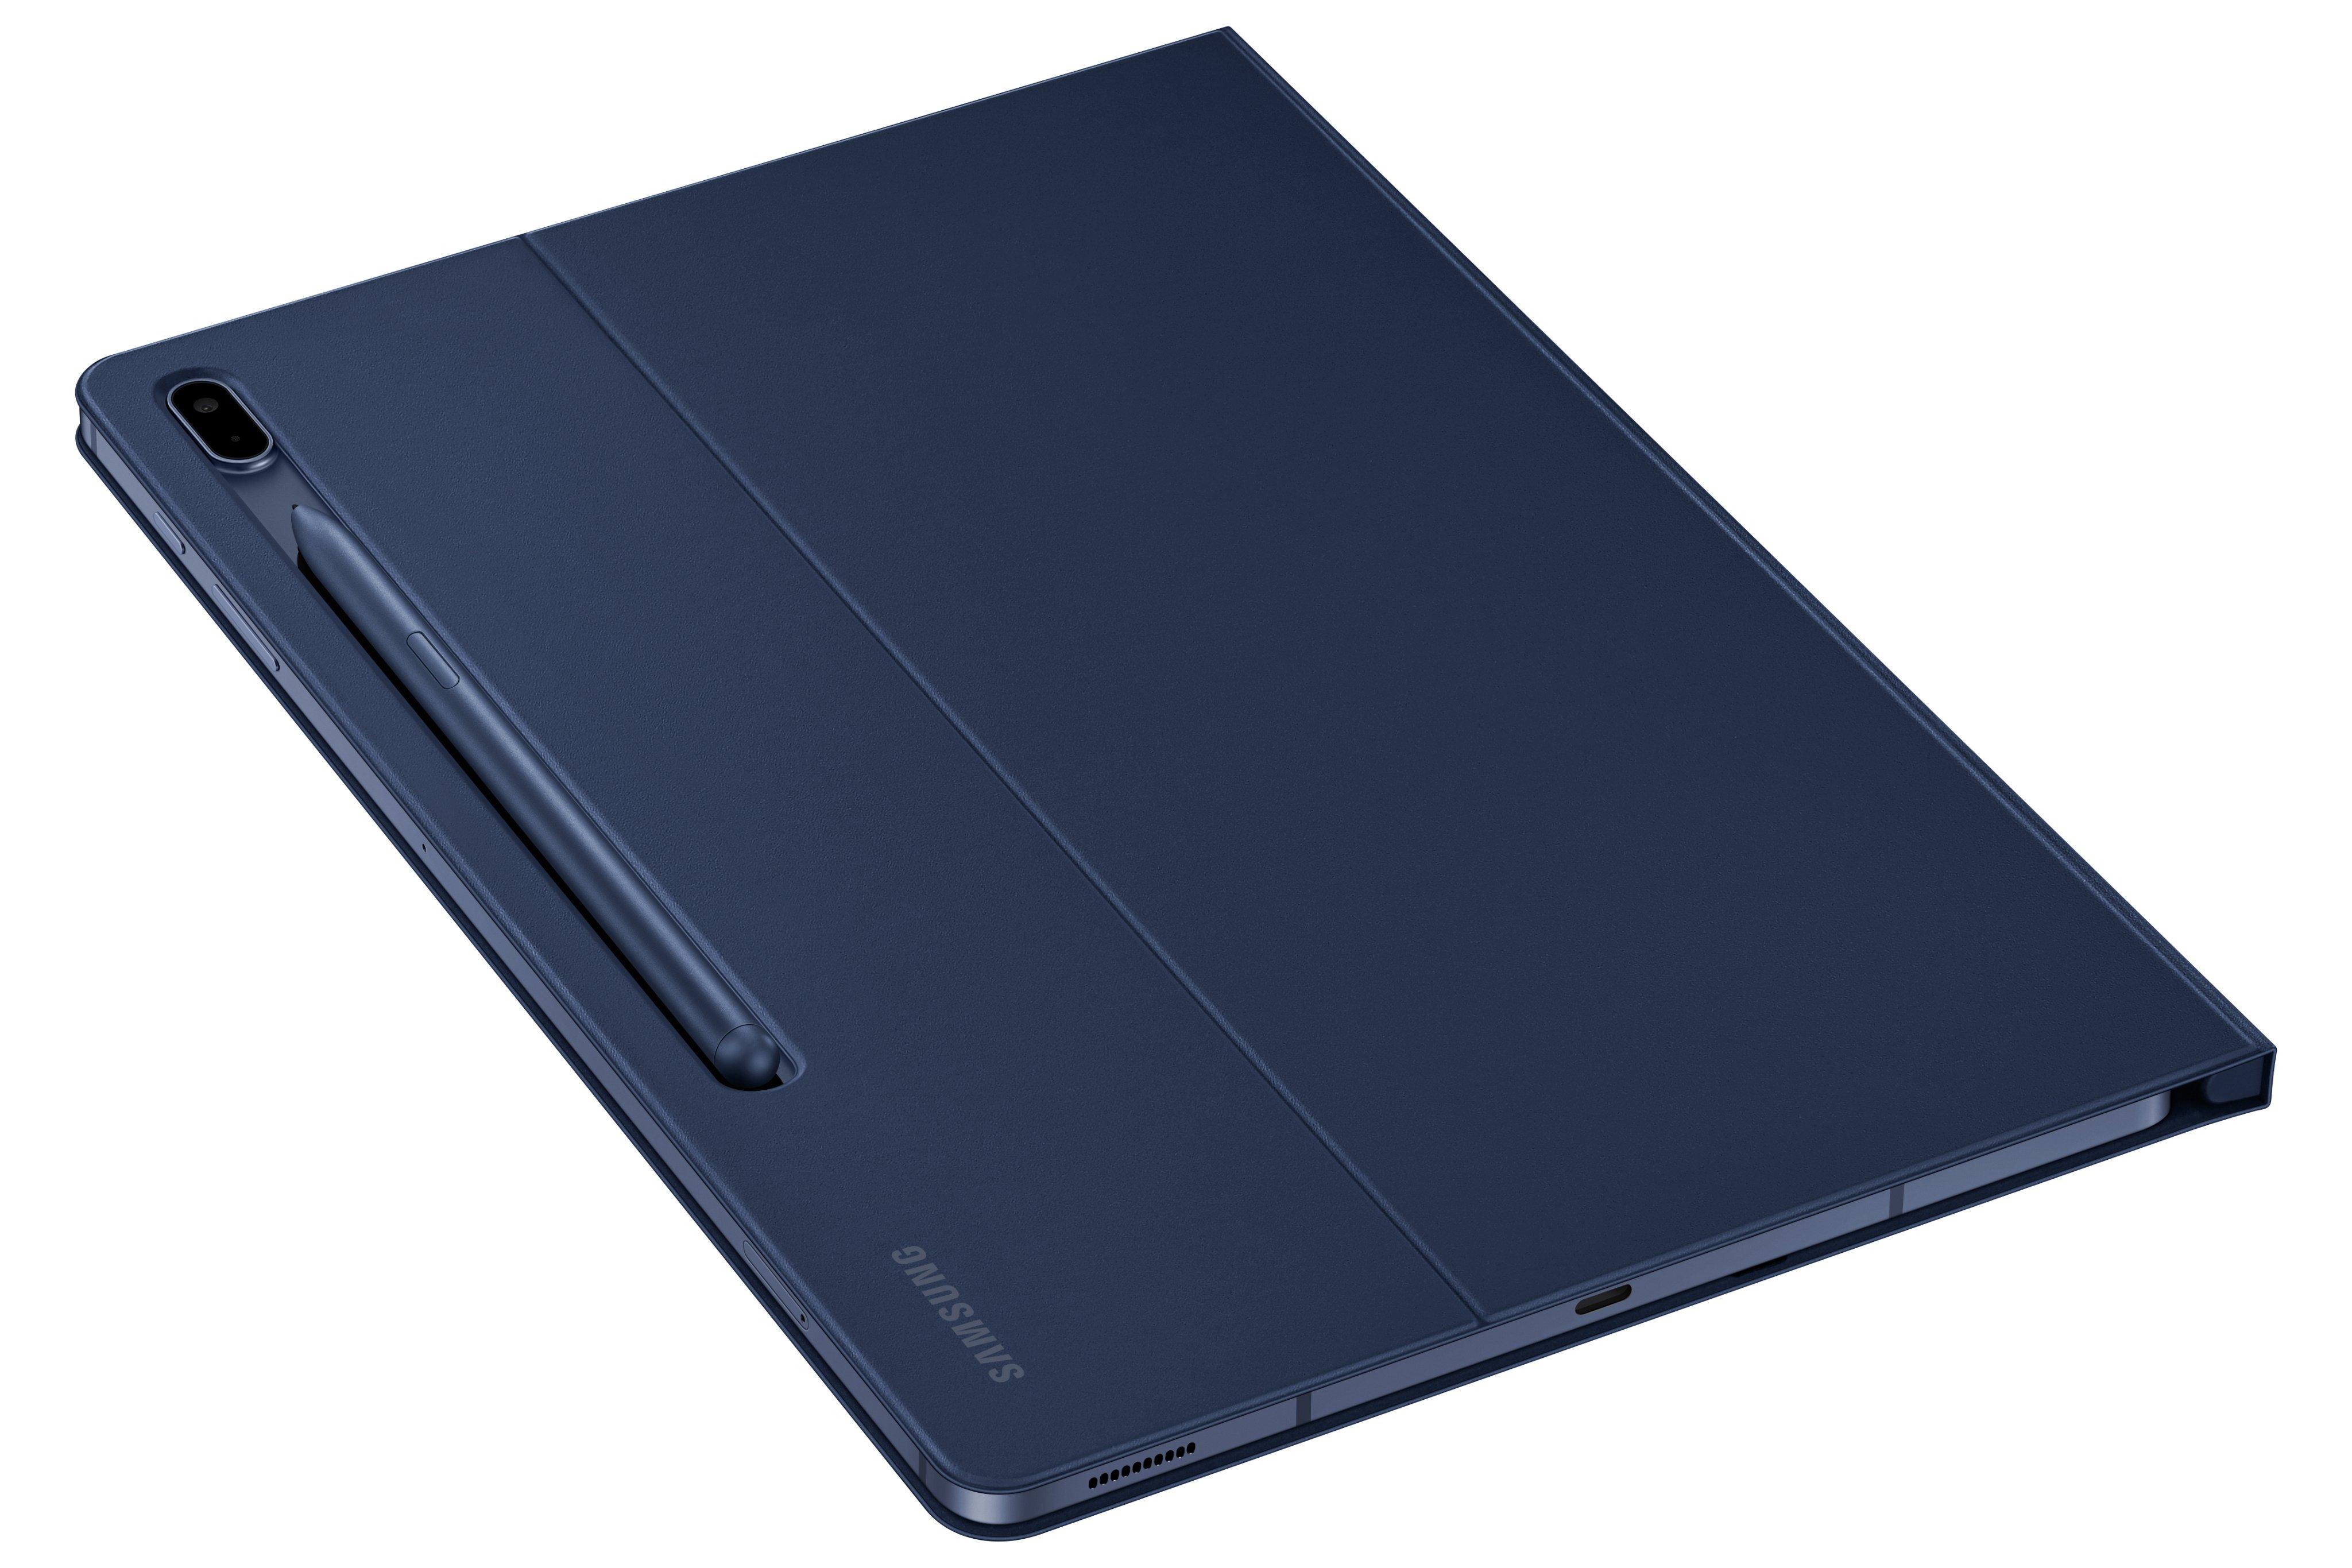 Samsung Galaxy Tab S7+ Lite в четырёх новых цветах Samsung  - samsung_galaxy_tab_s7_lite_vo_vseh_cvetah_i_rakursah_na_press_foto_picture6_7